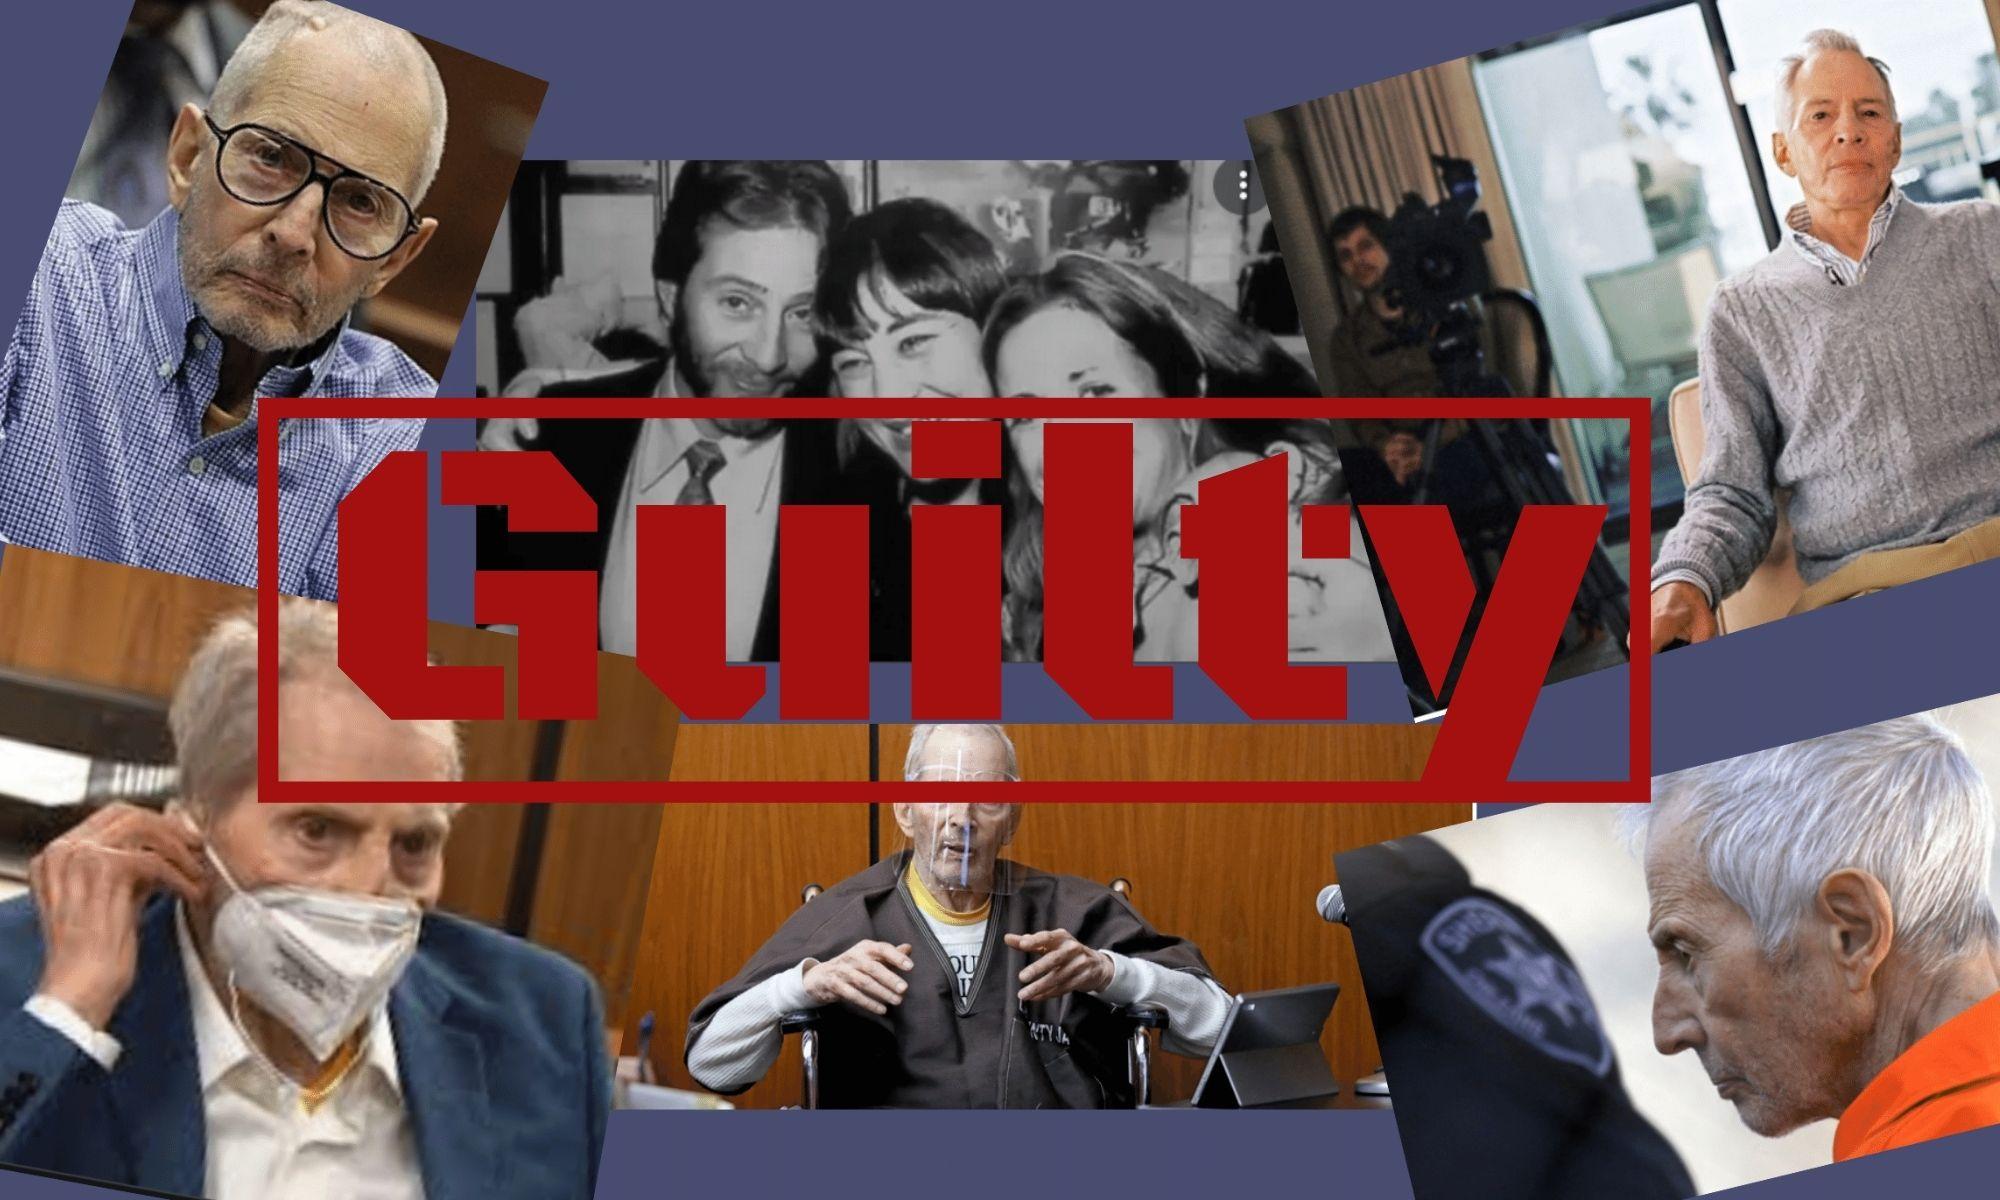 Robert Durst Convicted of Murder on his Friend Susan Berman